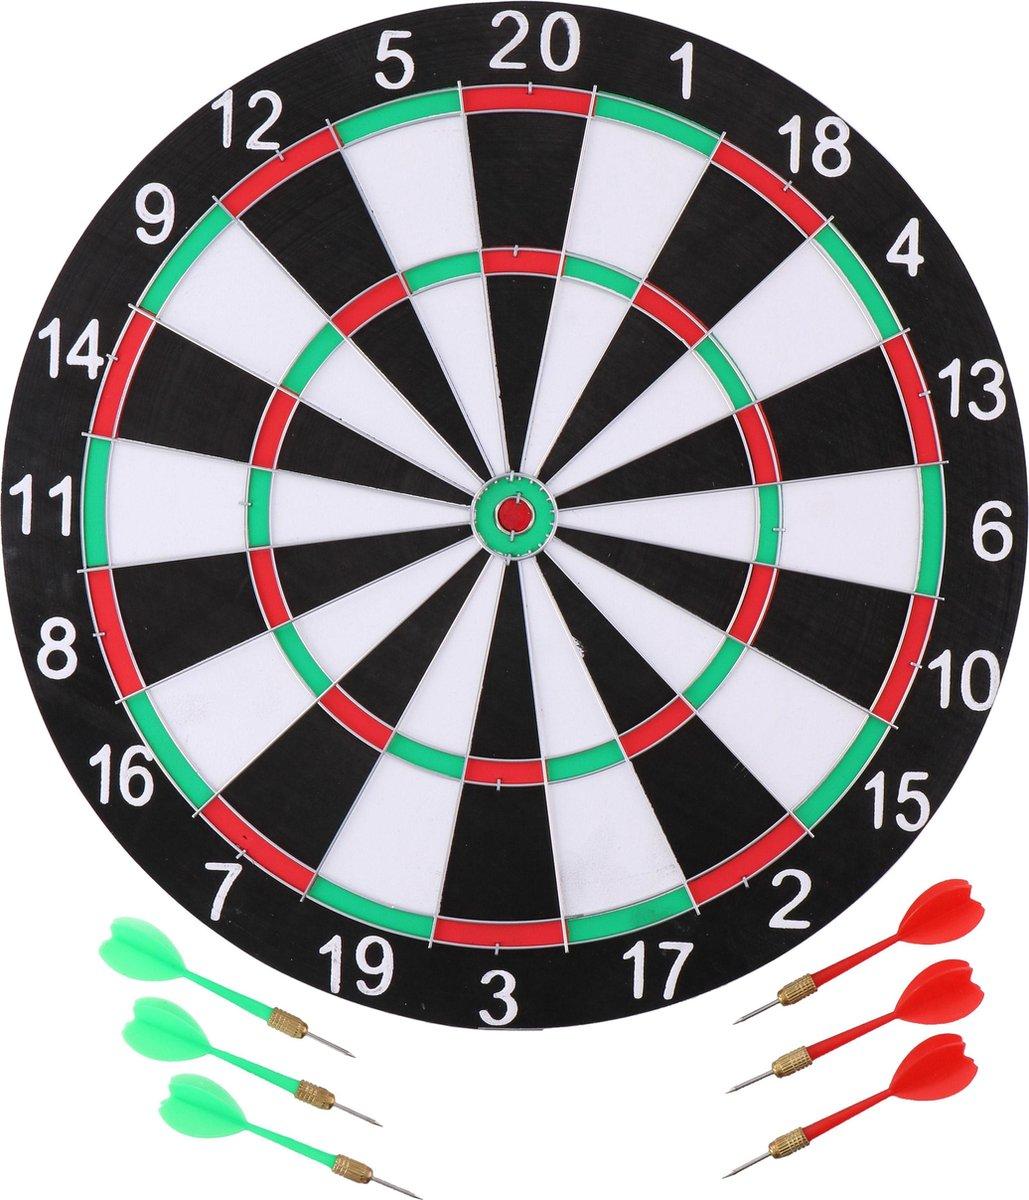 Masterdarts Dartbord - 40,5 cm - tweezijdig - met 6 darts